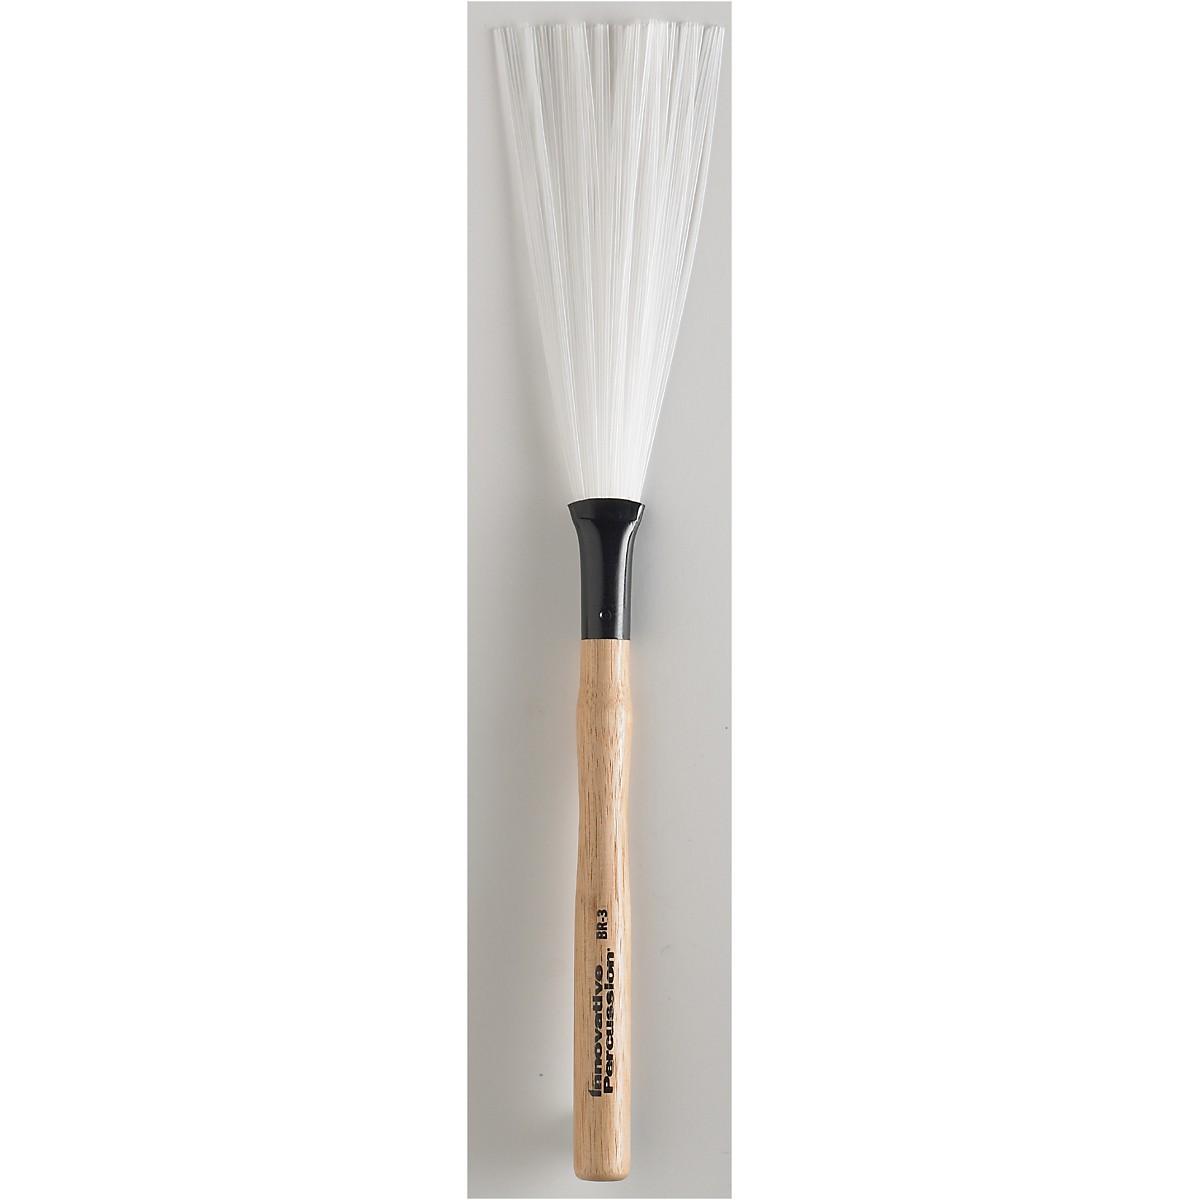 Innovative Percussion Nylon Brushes